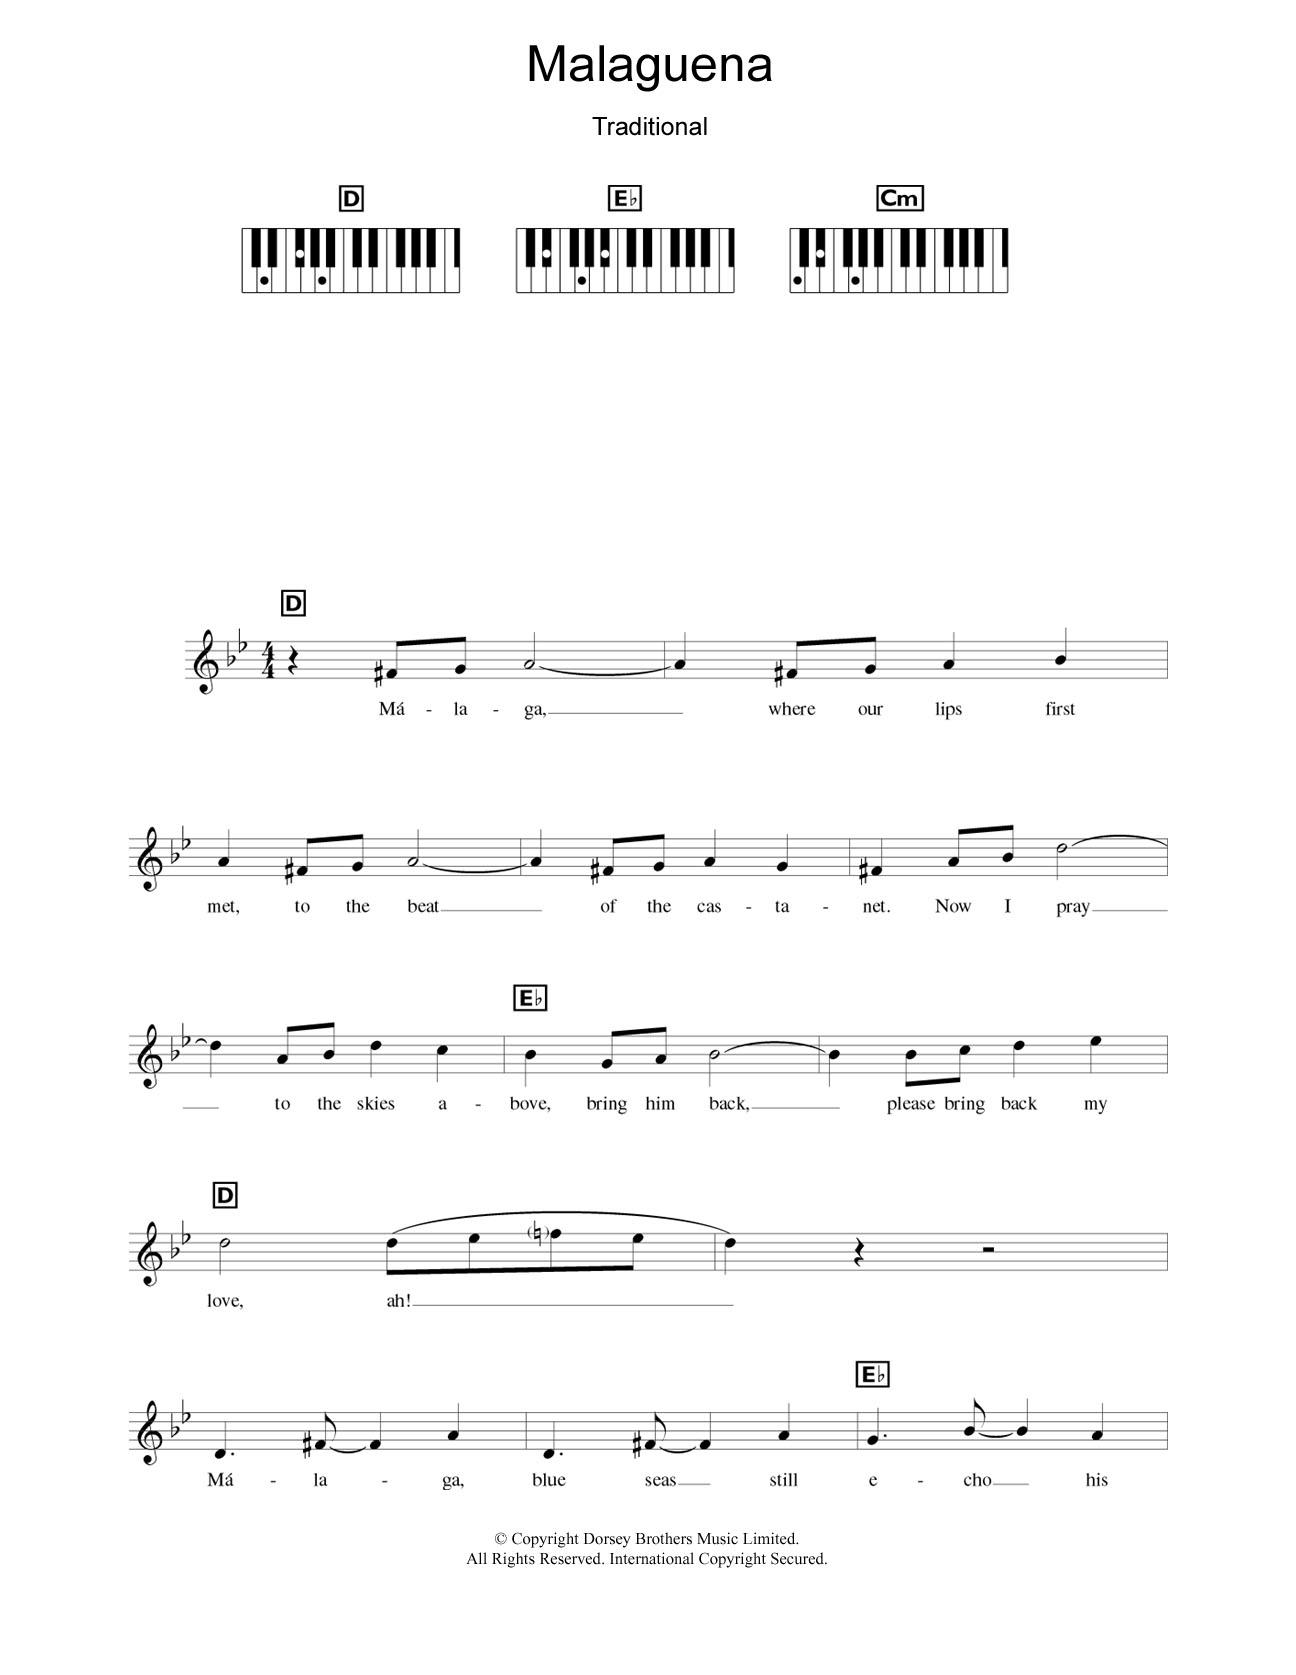 Malaguena Sheet Music